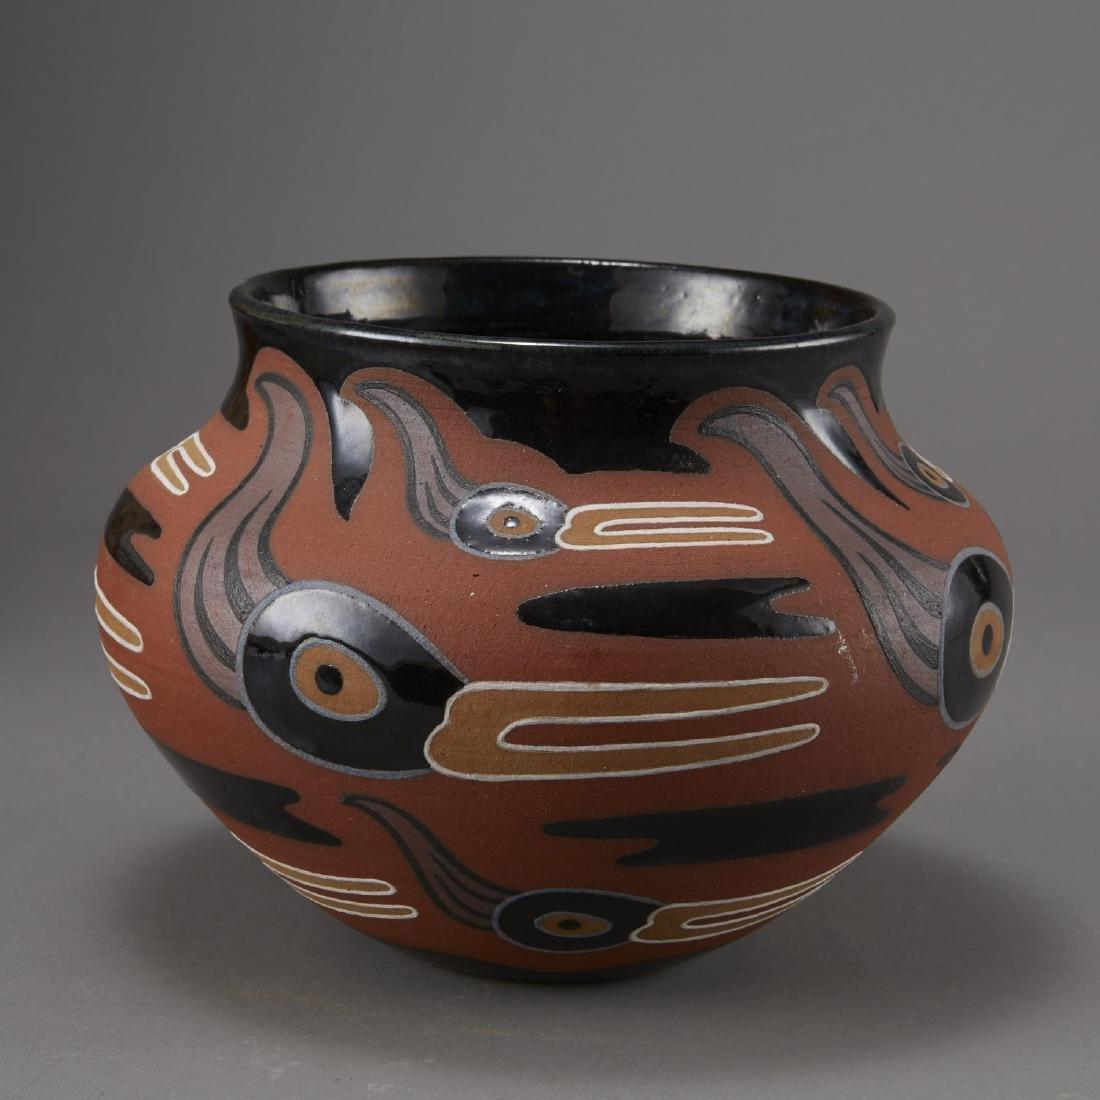 6 Pueblo Pottery Pots incld Fragua, Nez, Medina - 8